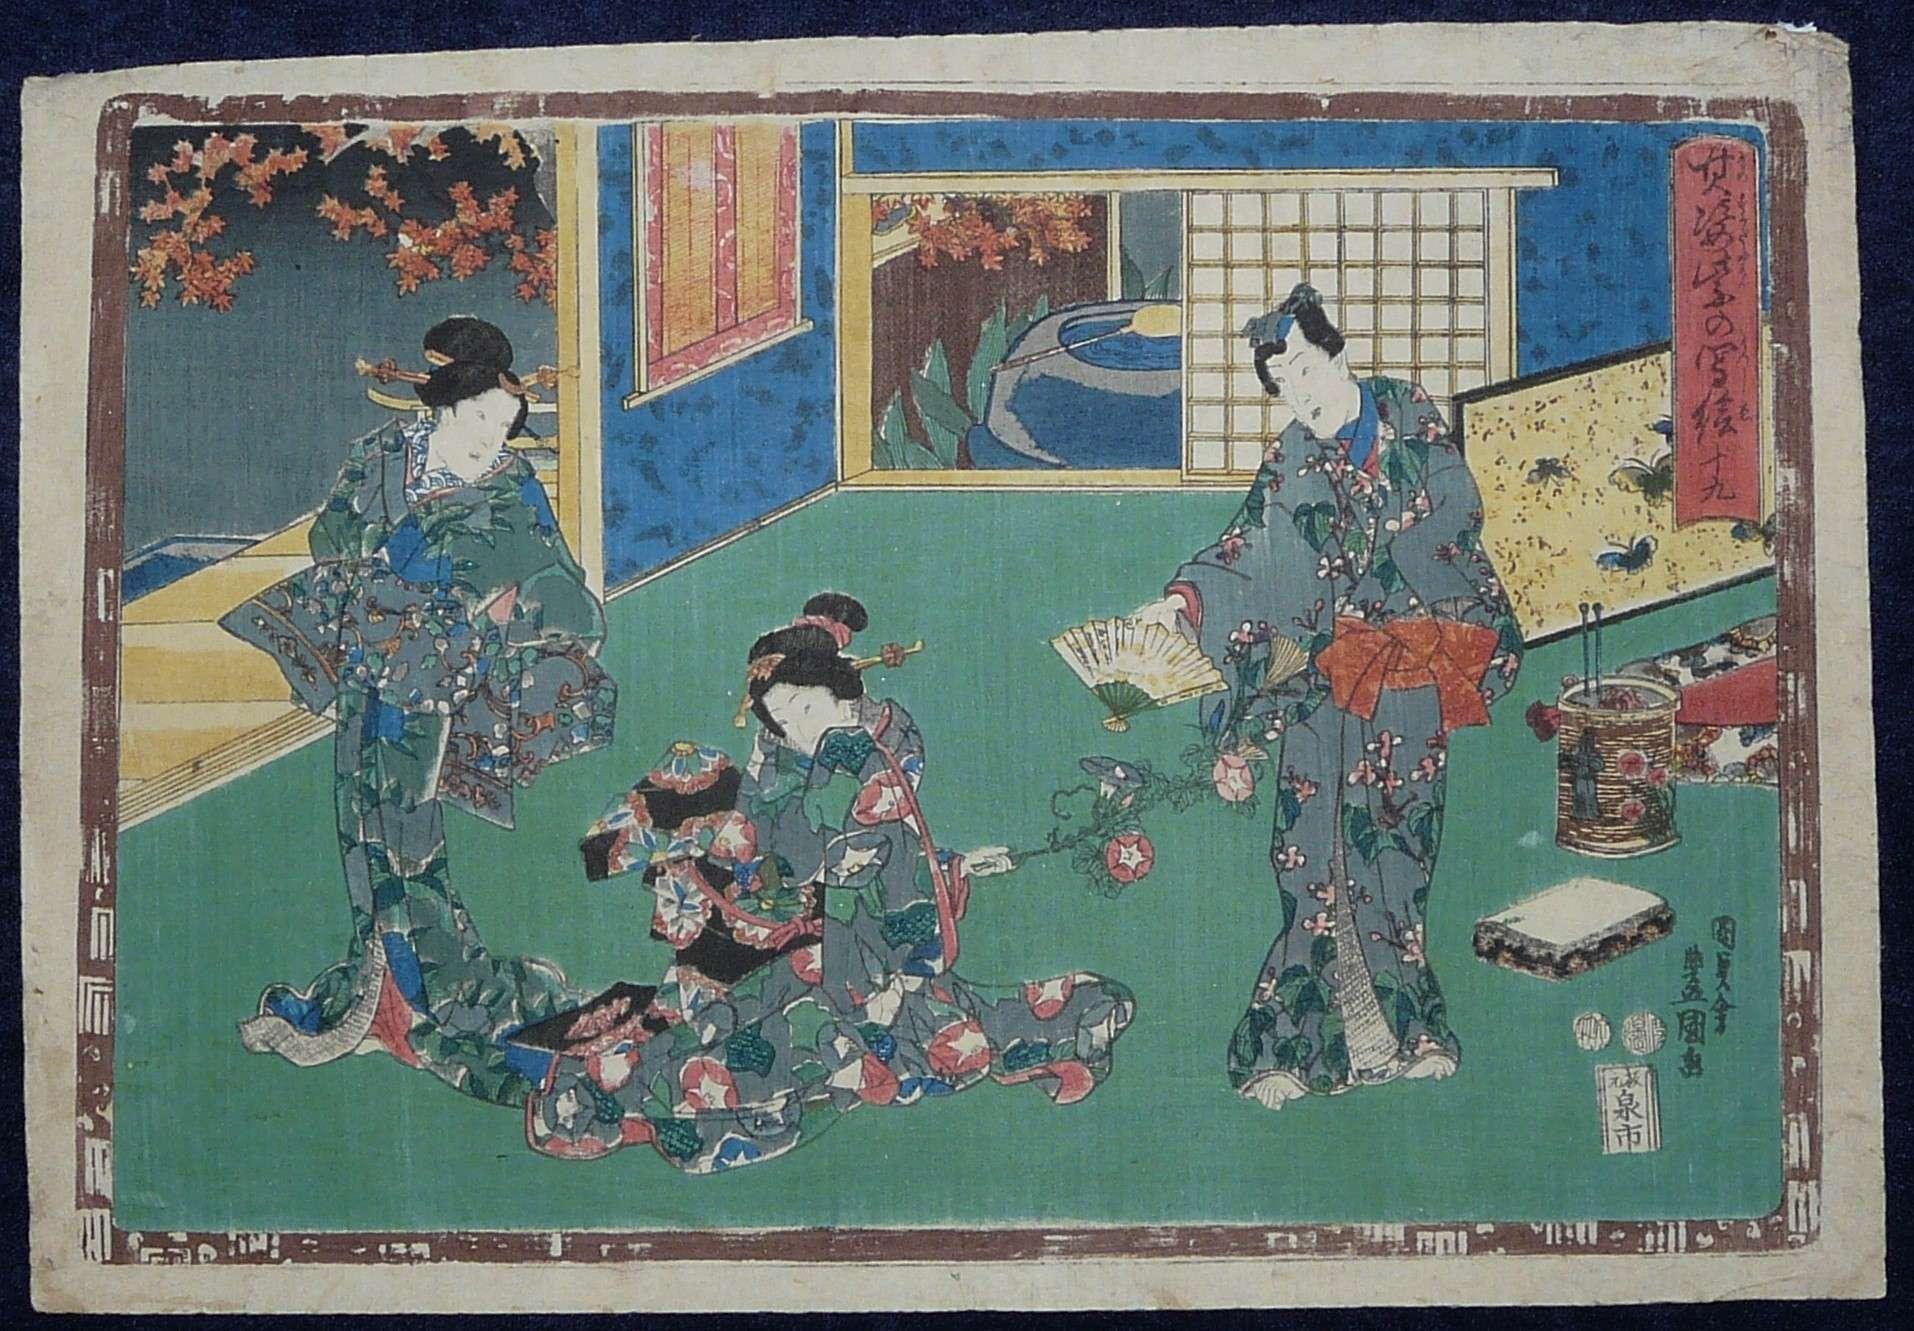 UTAGAWA KUNISADA: #P3400 SCENE 19 USUGUMO FROM THE SERIES SONO SUGATA HIKARU NO UTUSHI-E - FAITHFUL DEPICTIONS OF THE FIGURE OF THE SHINING PRINCE Circa 1851